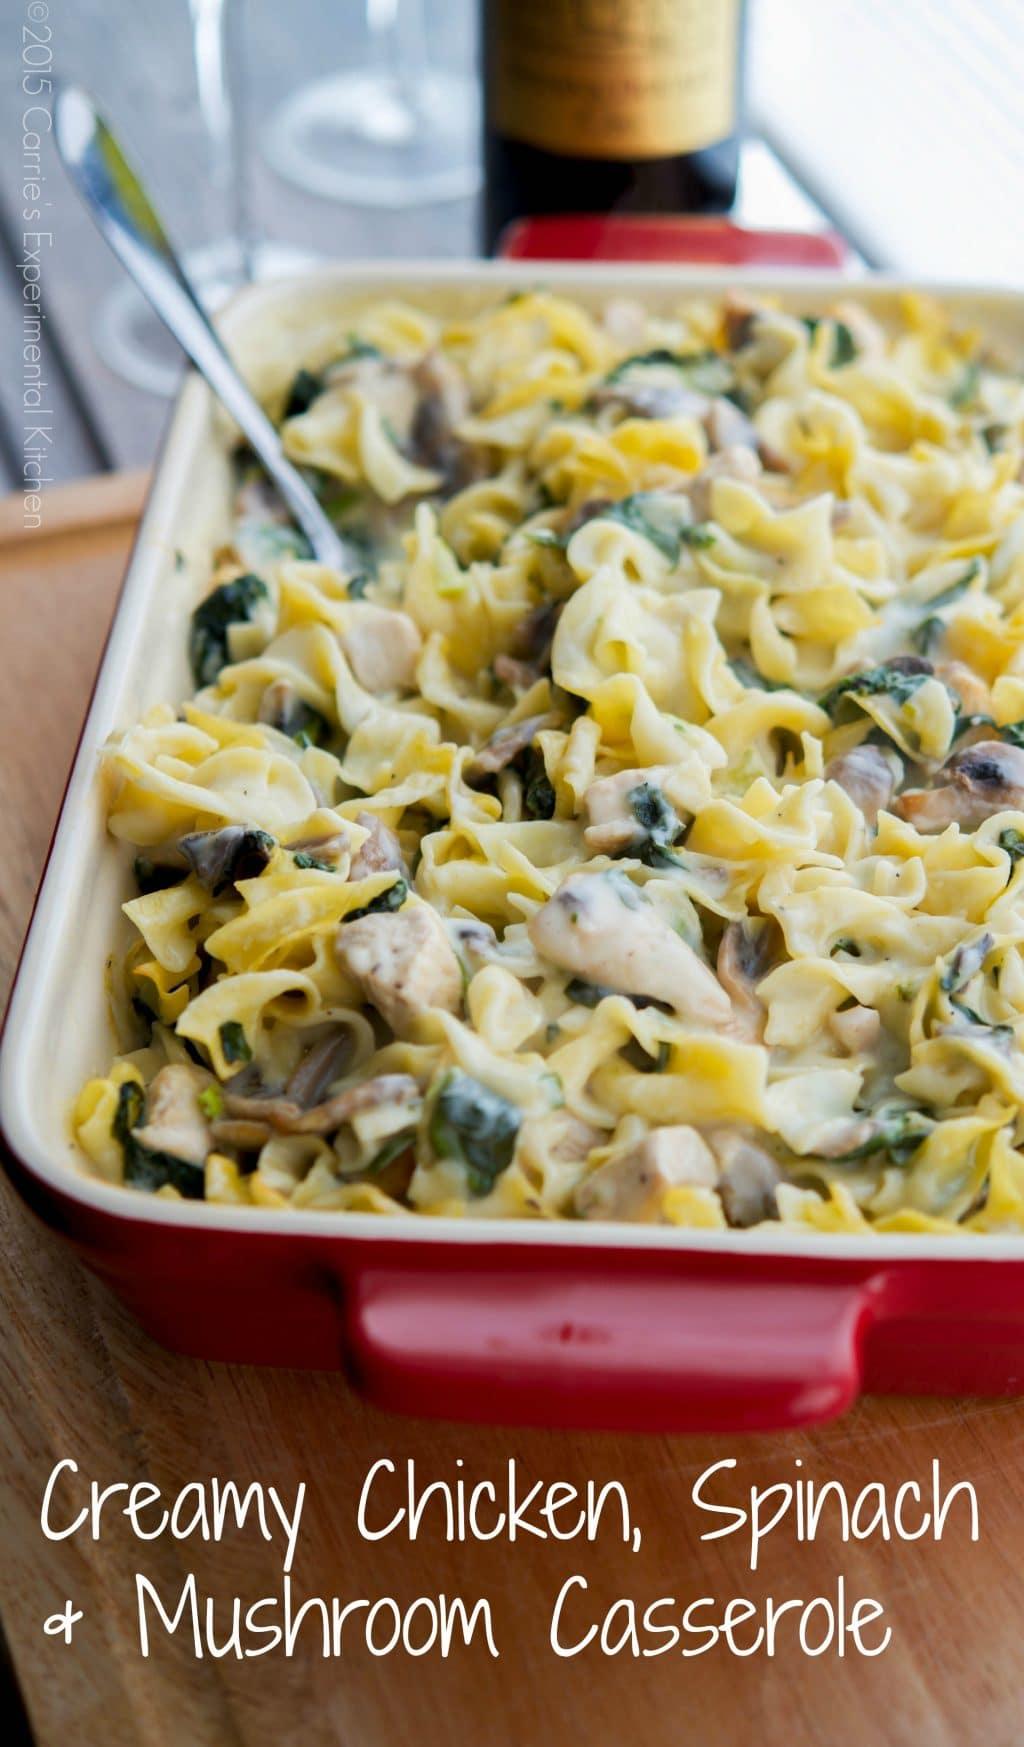 Creamy Chicken, Spinach & Mushroom Casserole - Carrie's Experimental ...